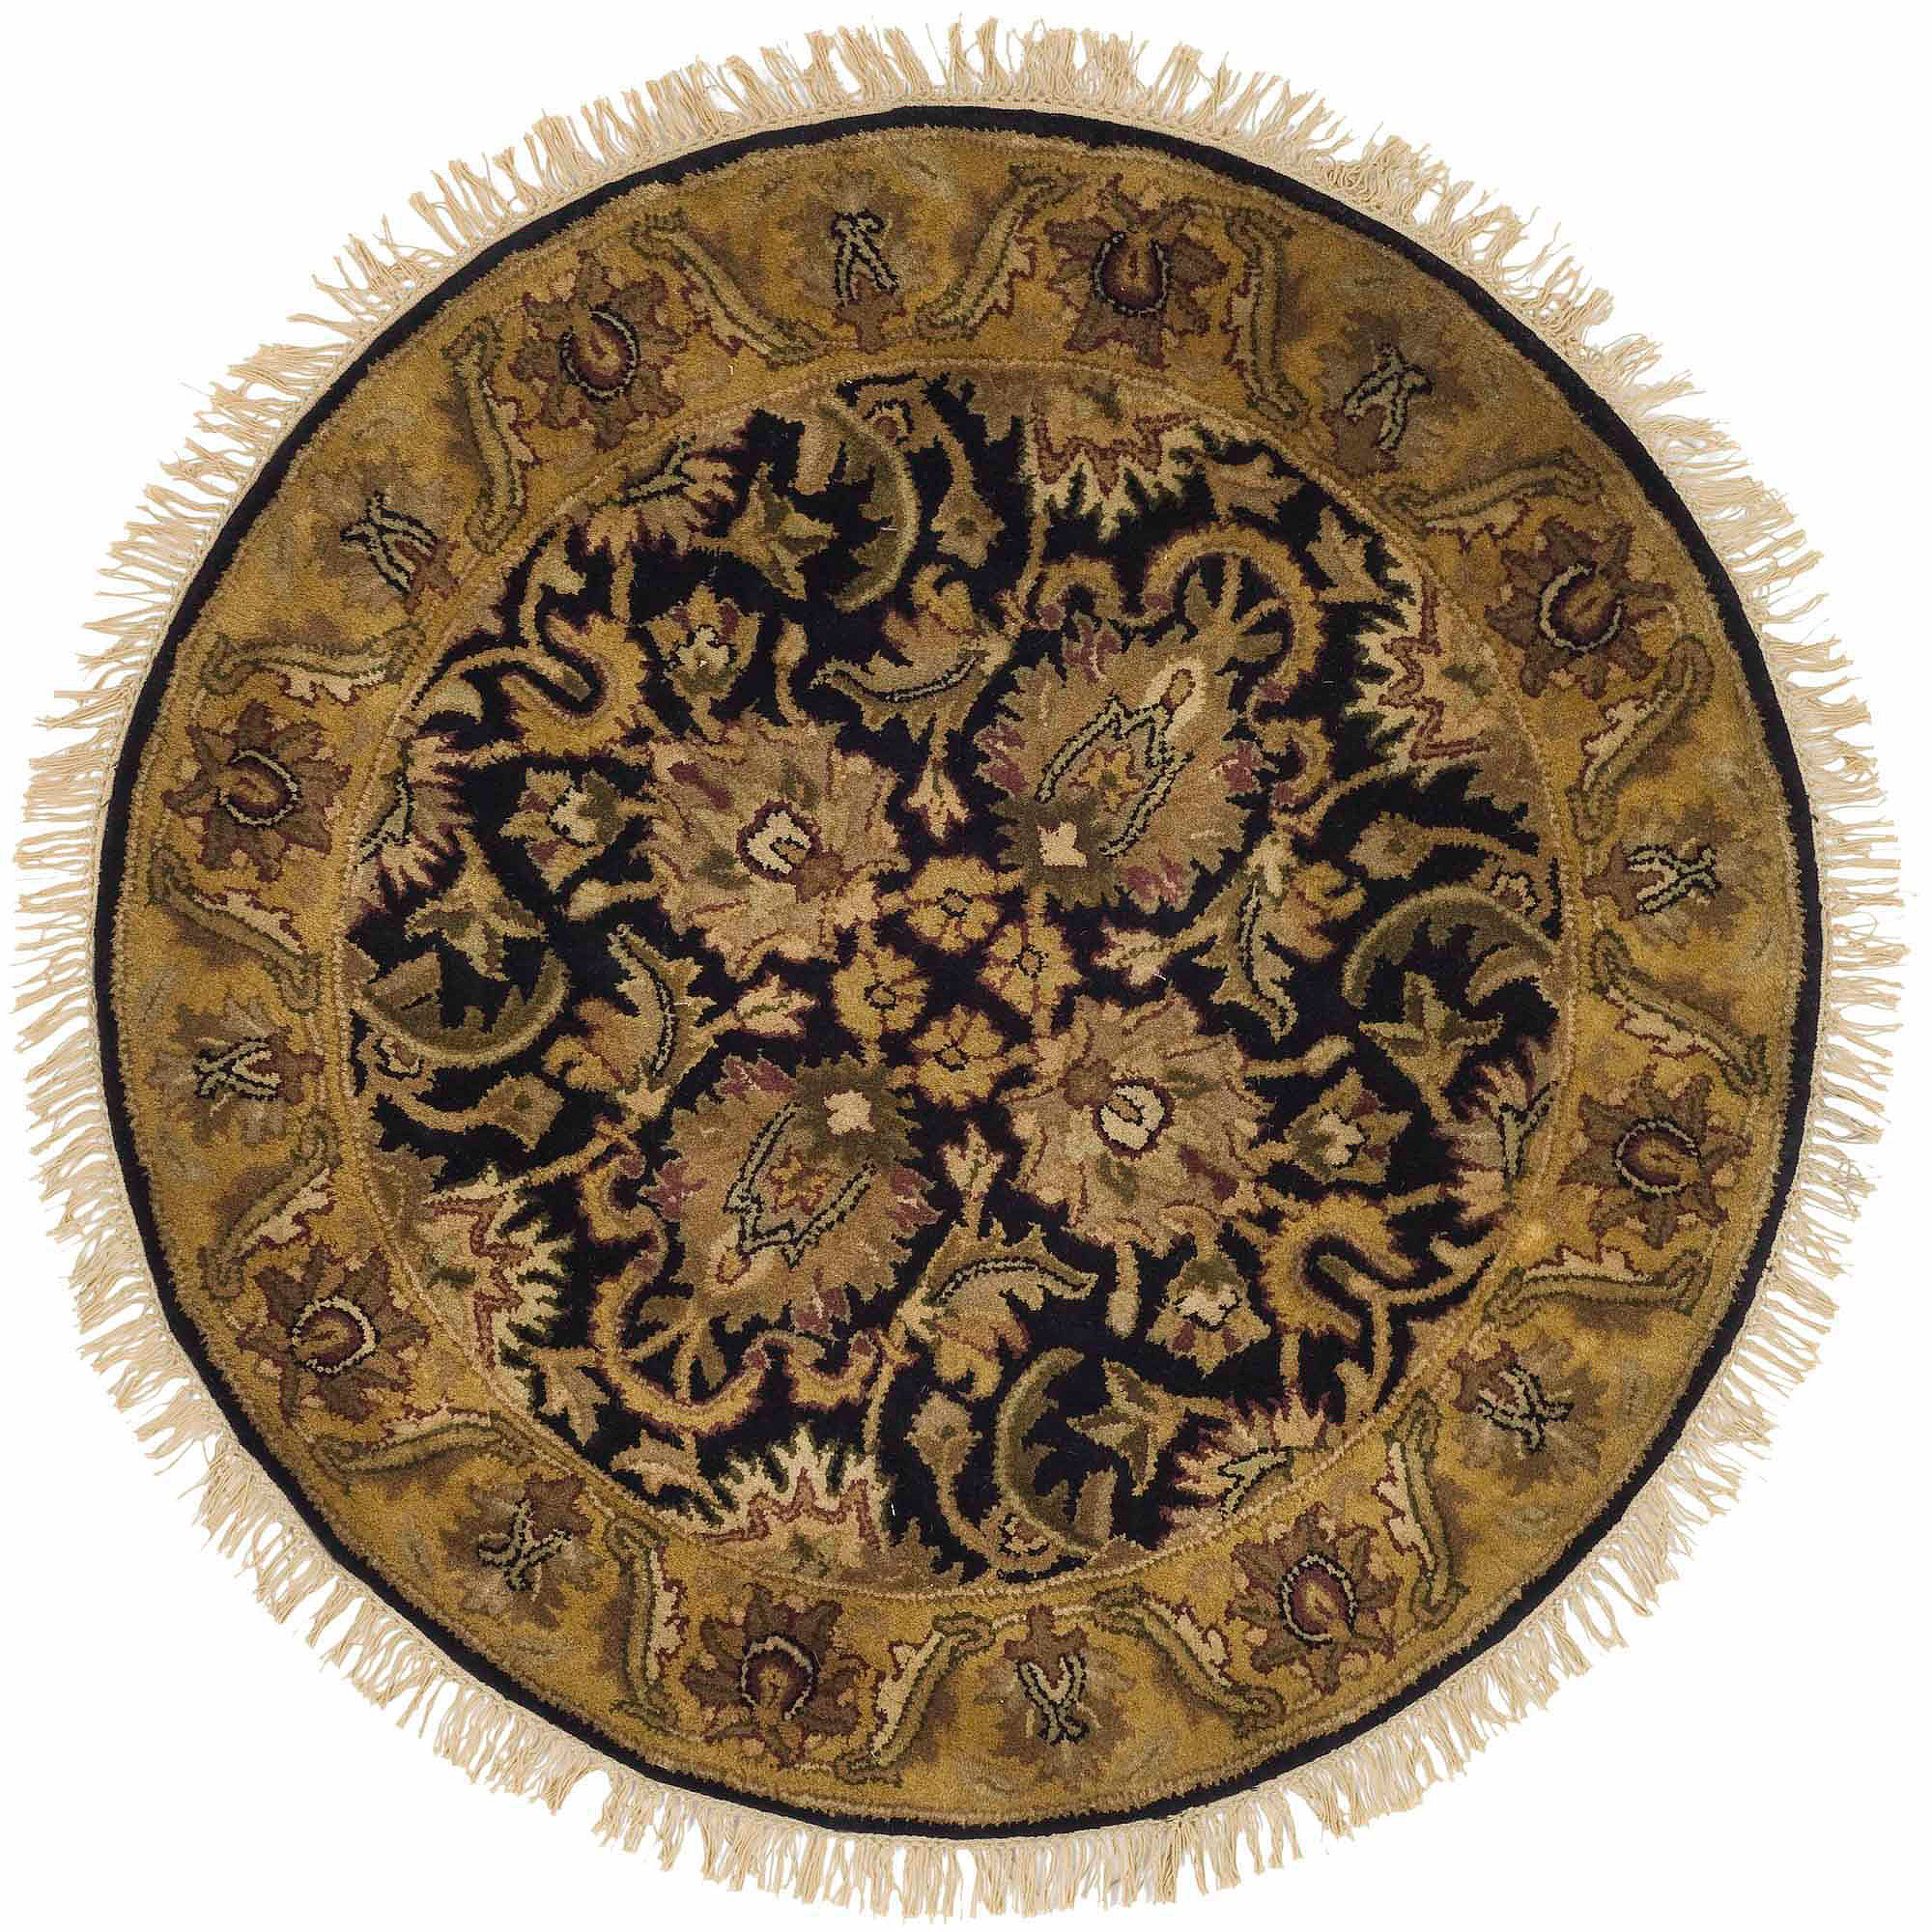 Safavieh Classic Houston Tufted Wool Area Rug, Black/Gold